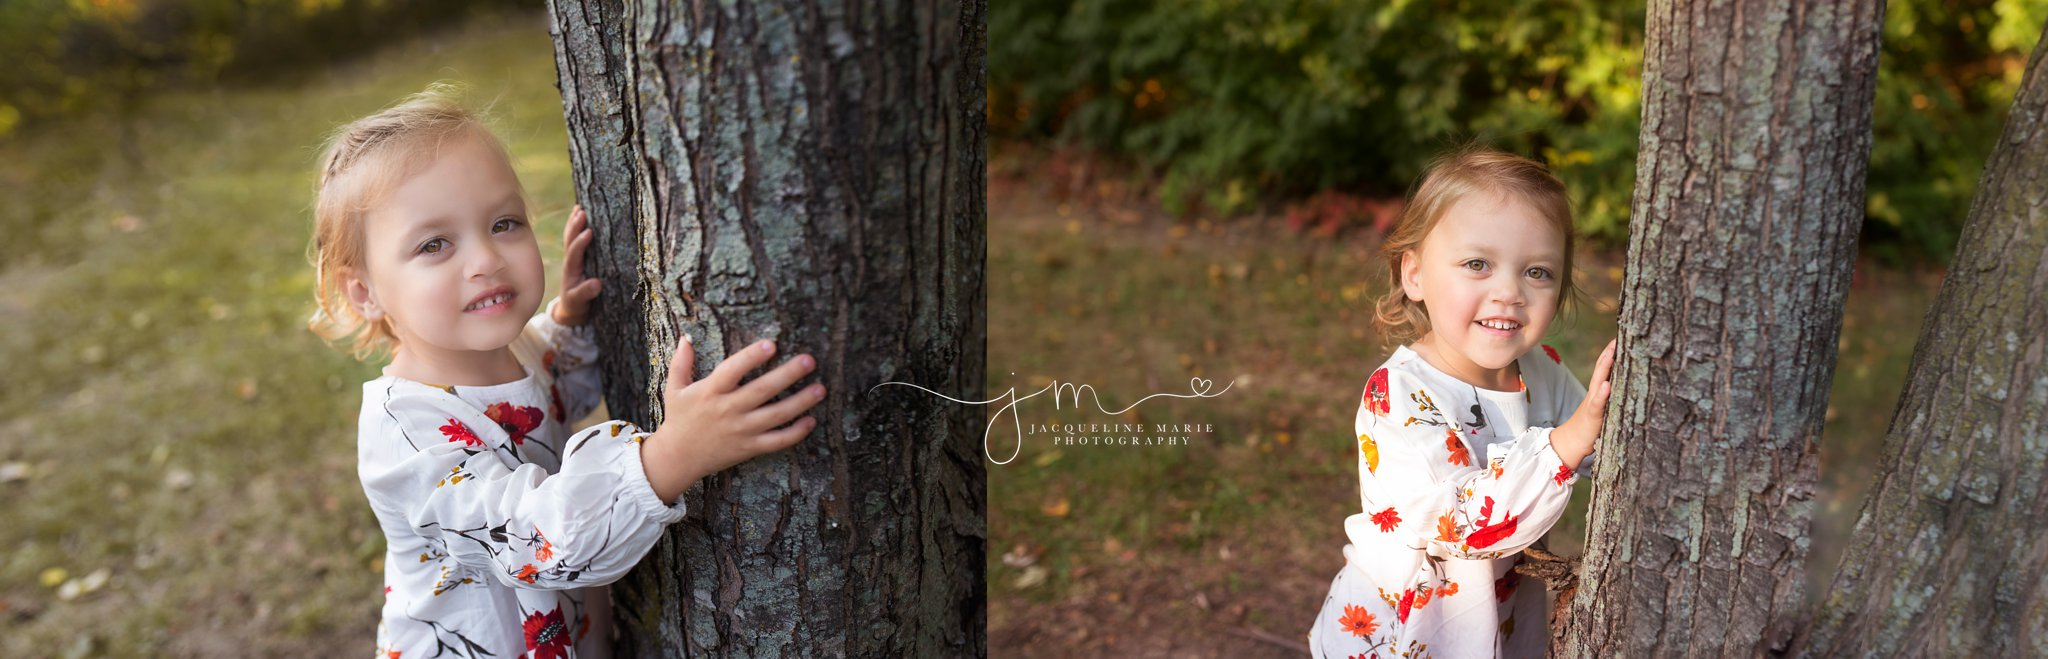 Columbus OH children photographer, children photography Columbus Ohio, twin photography, fall sibling photos